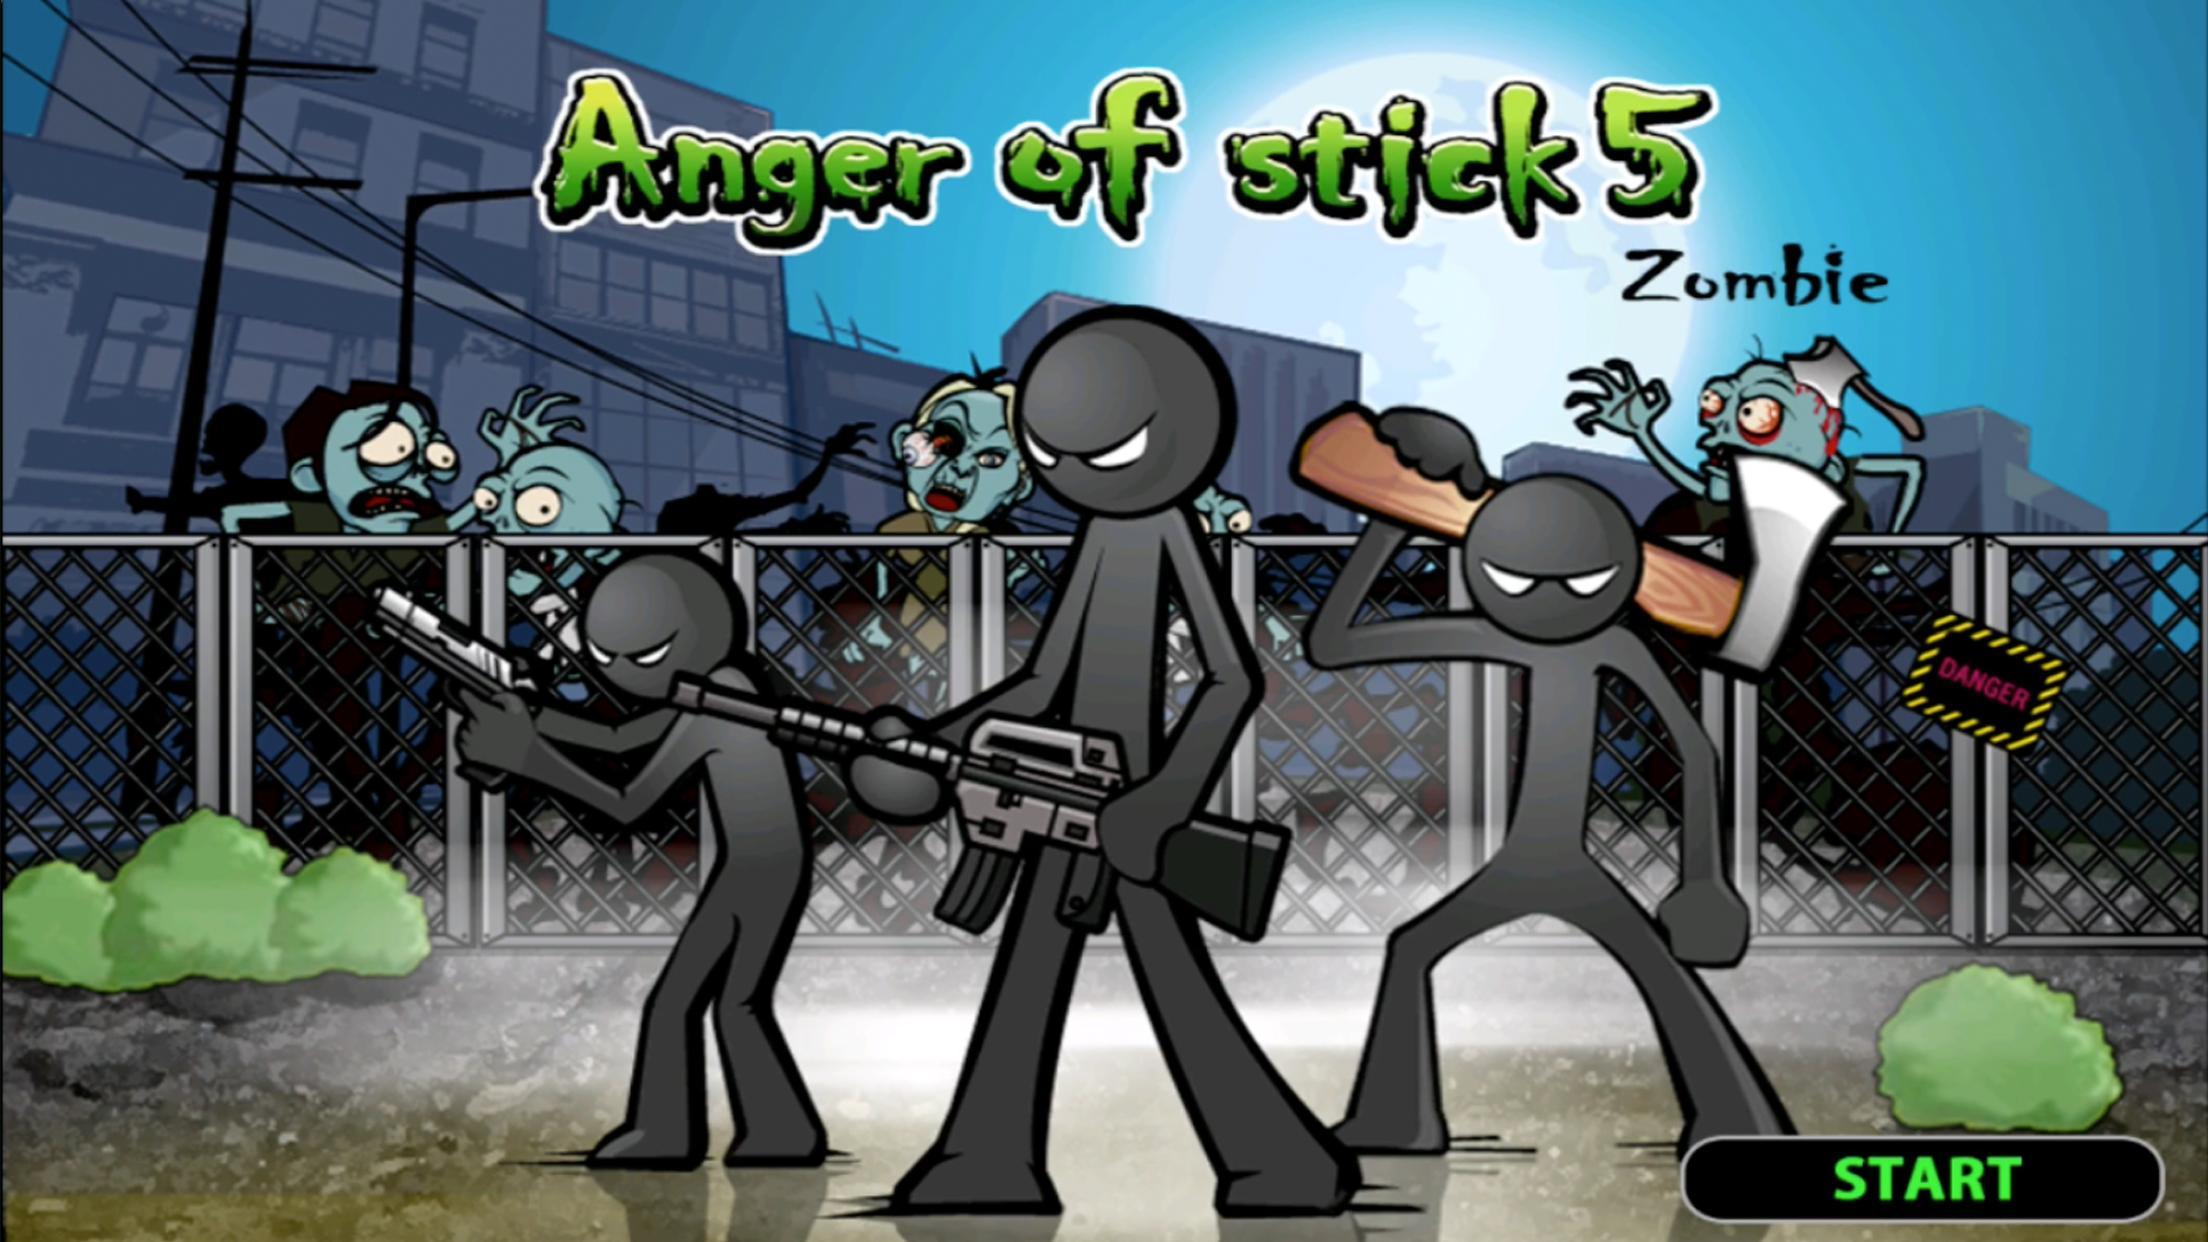 Anger of stick 5 : zombie 1.1.33 Screenshot 7